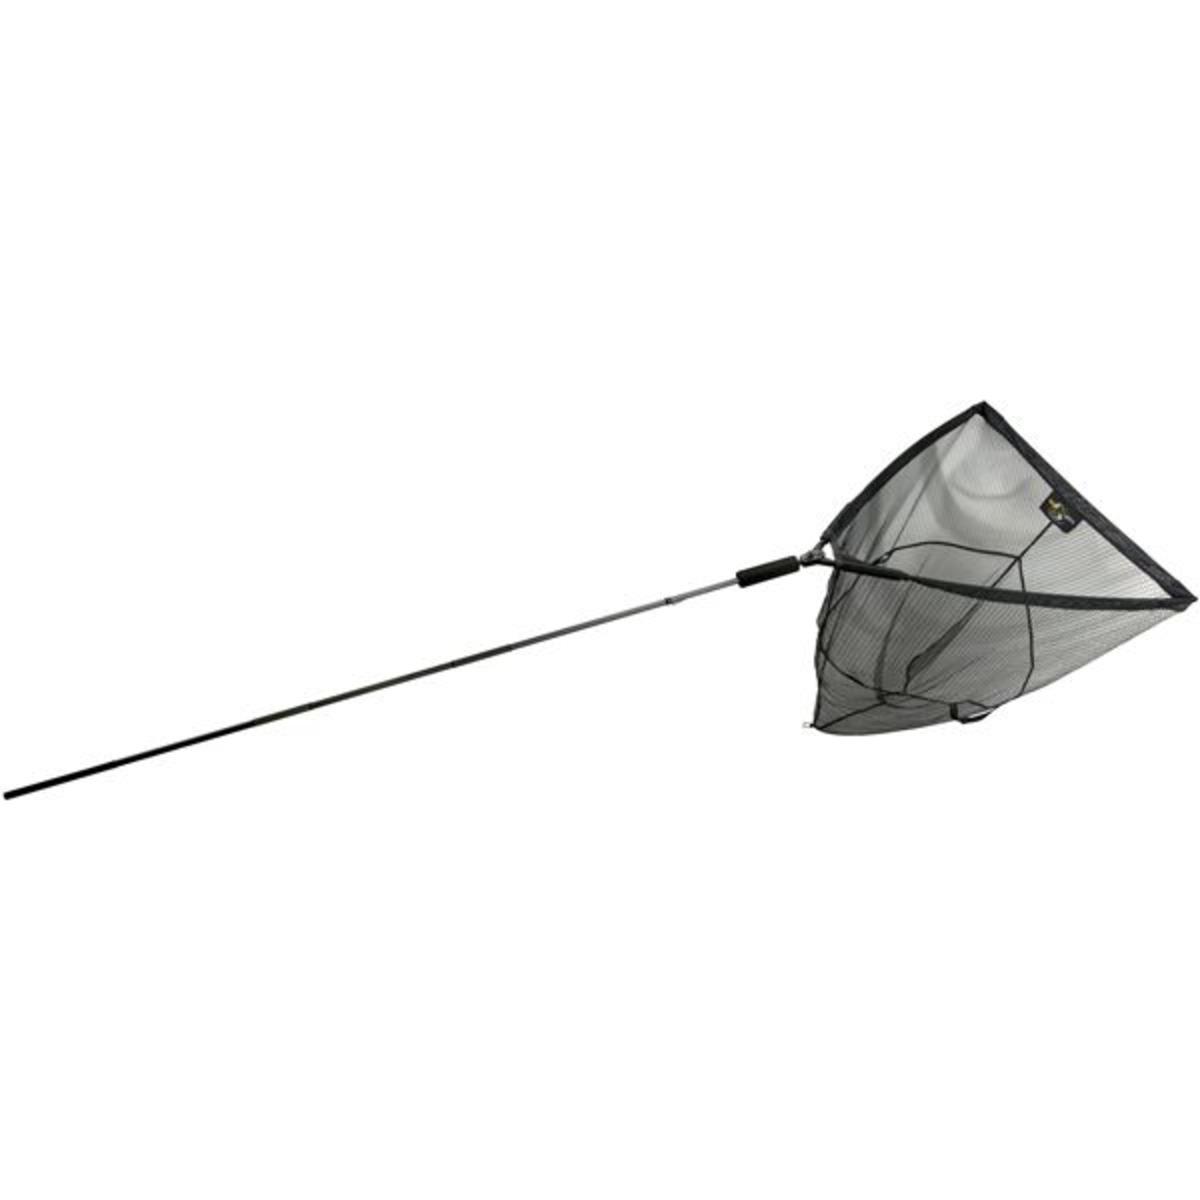 Carp Spirit Slim Net - Slim Net - Foldable Head - 105x115 cm